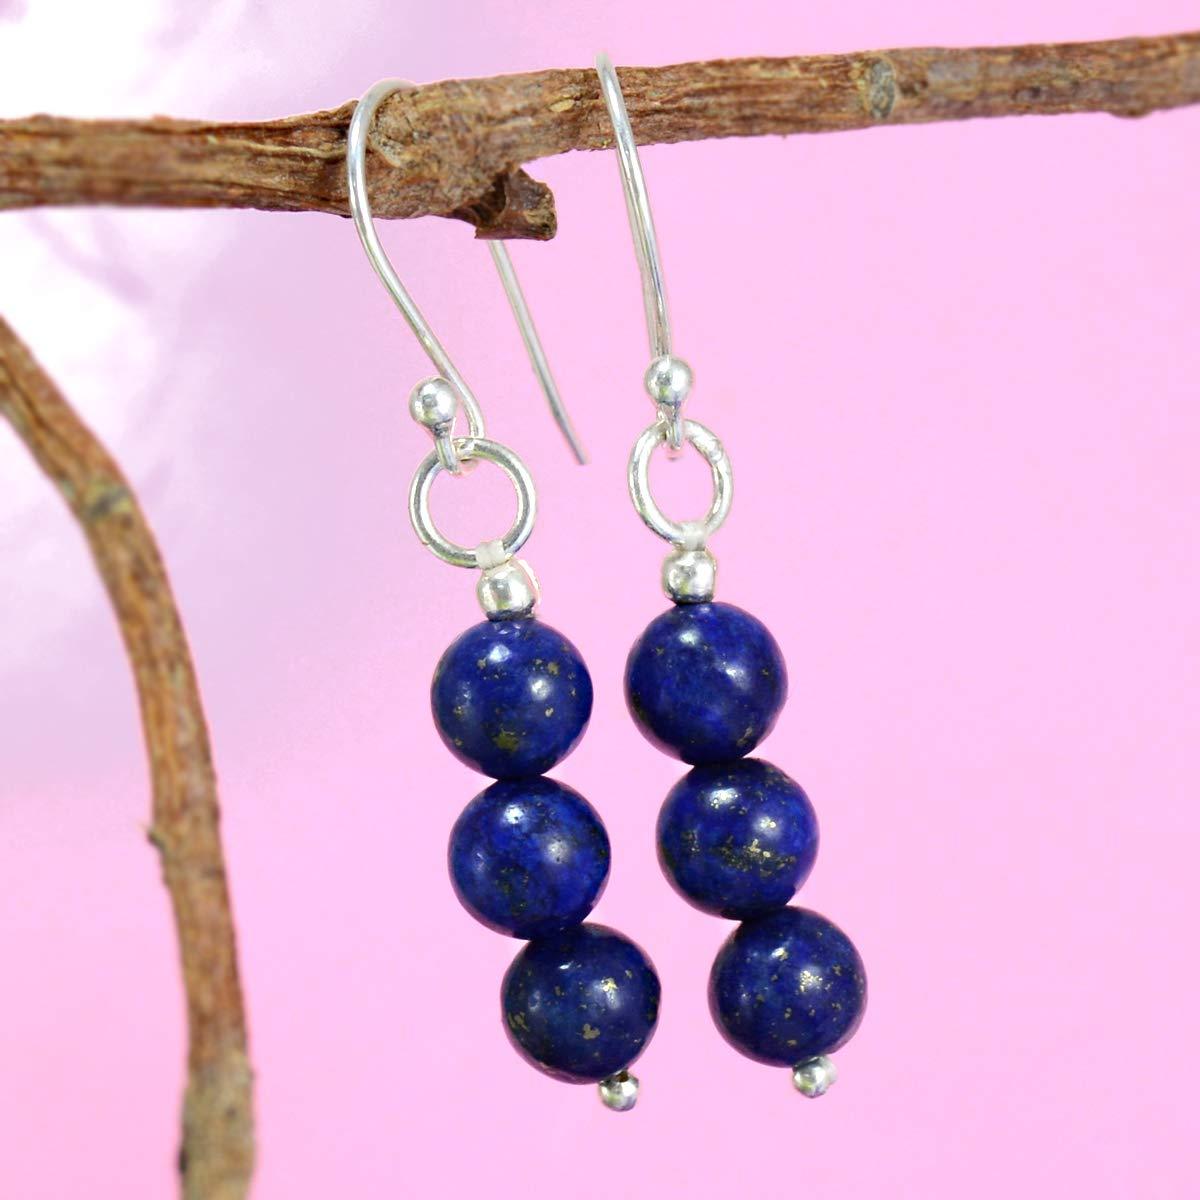 925 Sterling Silver Simple Dangle Earring Jaipur Rajasthan India Handmade Jewelry Manufacturer Deep Blue Lapis Lazuli